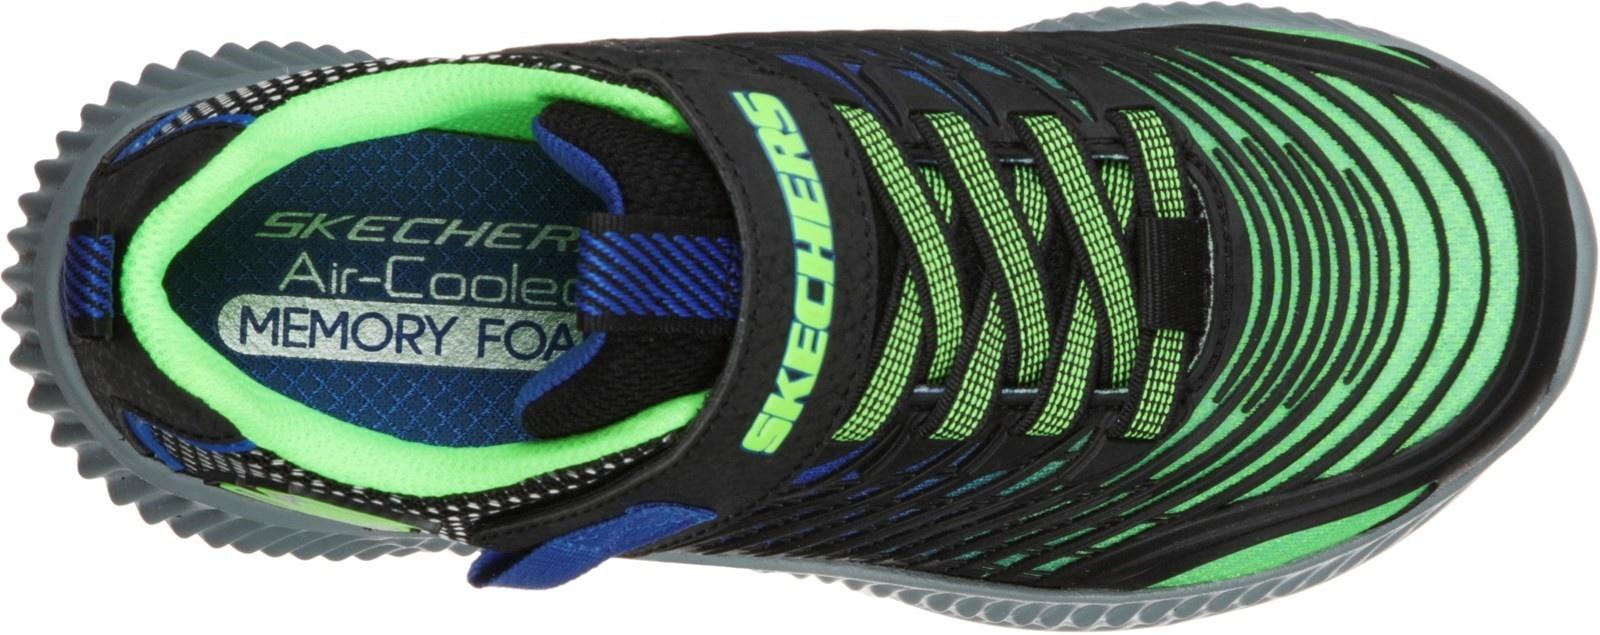 Skechers Optic Lime Blue